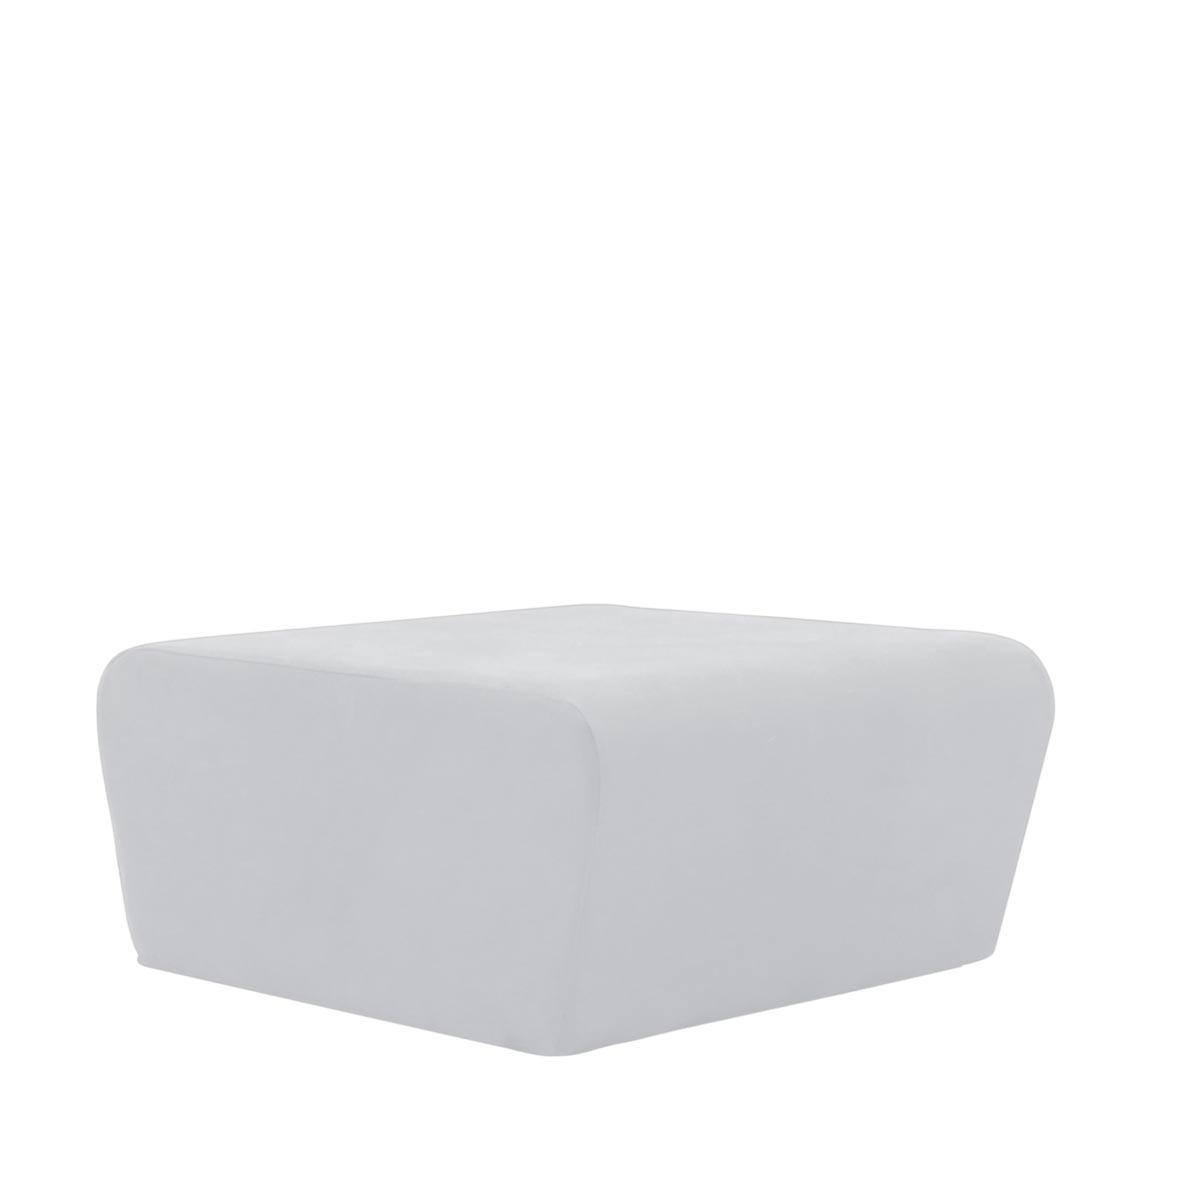 Pufe Muss R02 Tecido Lonita Branco 02